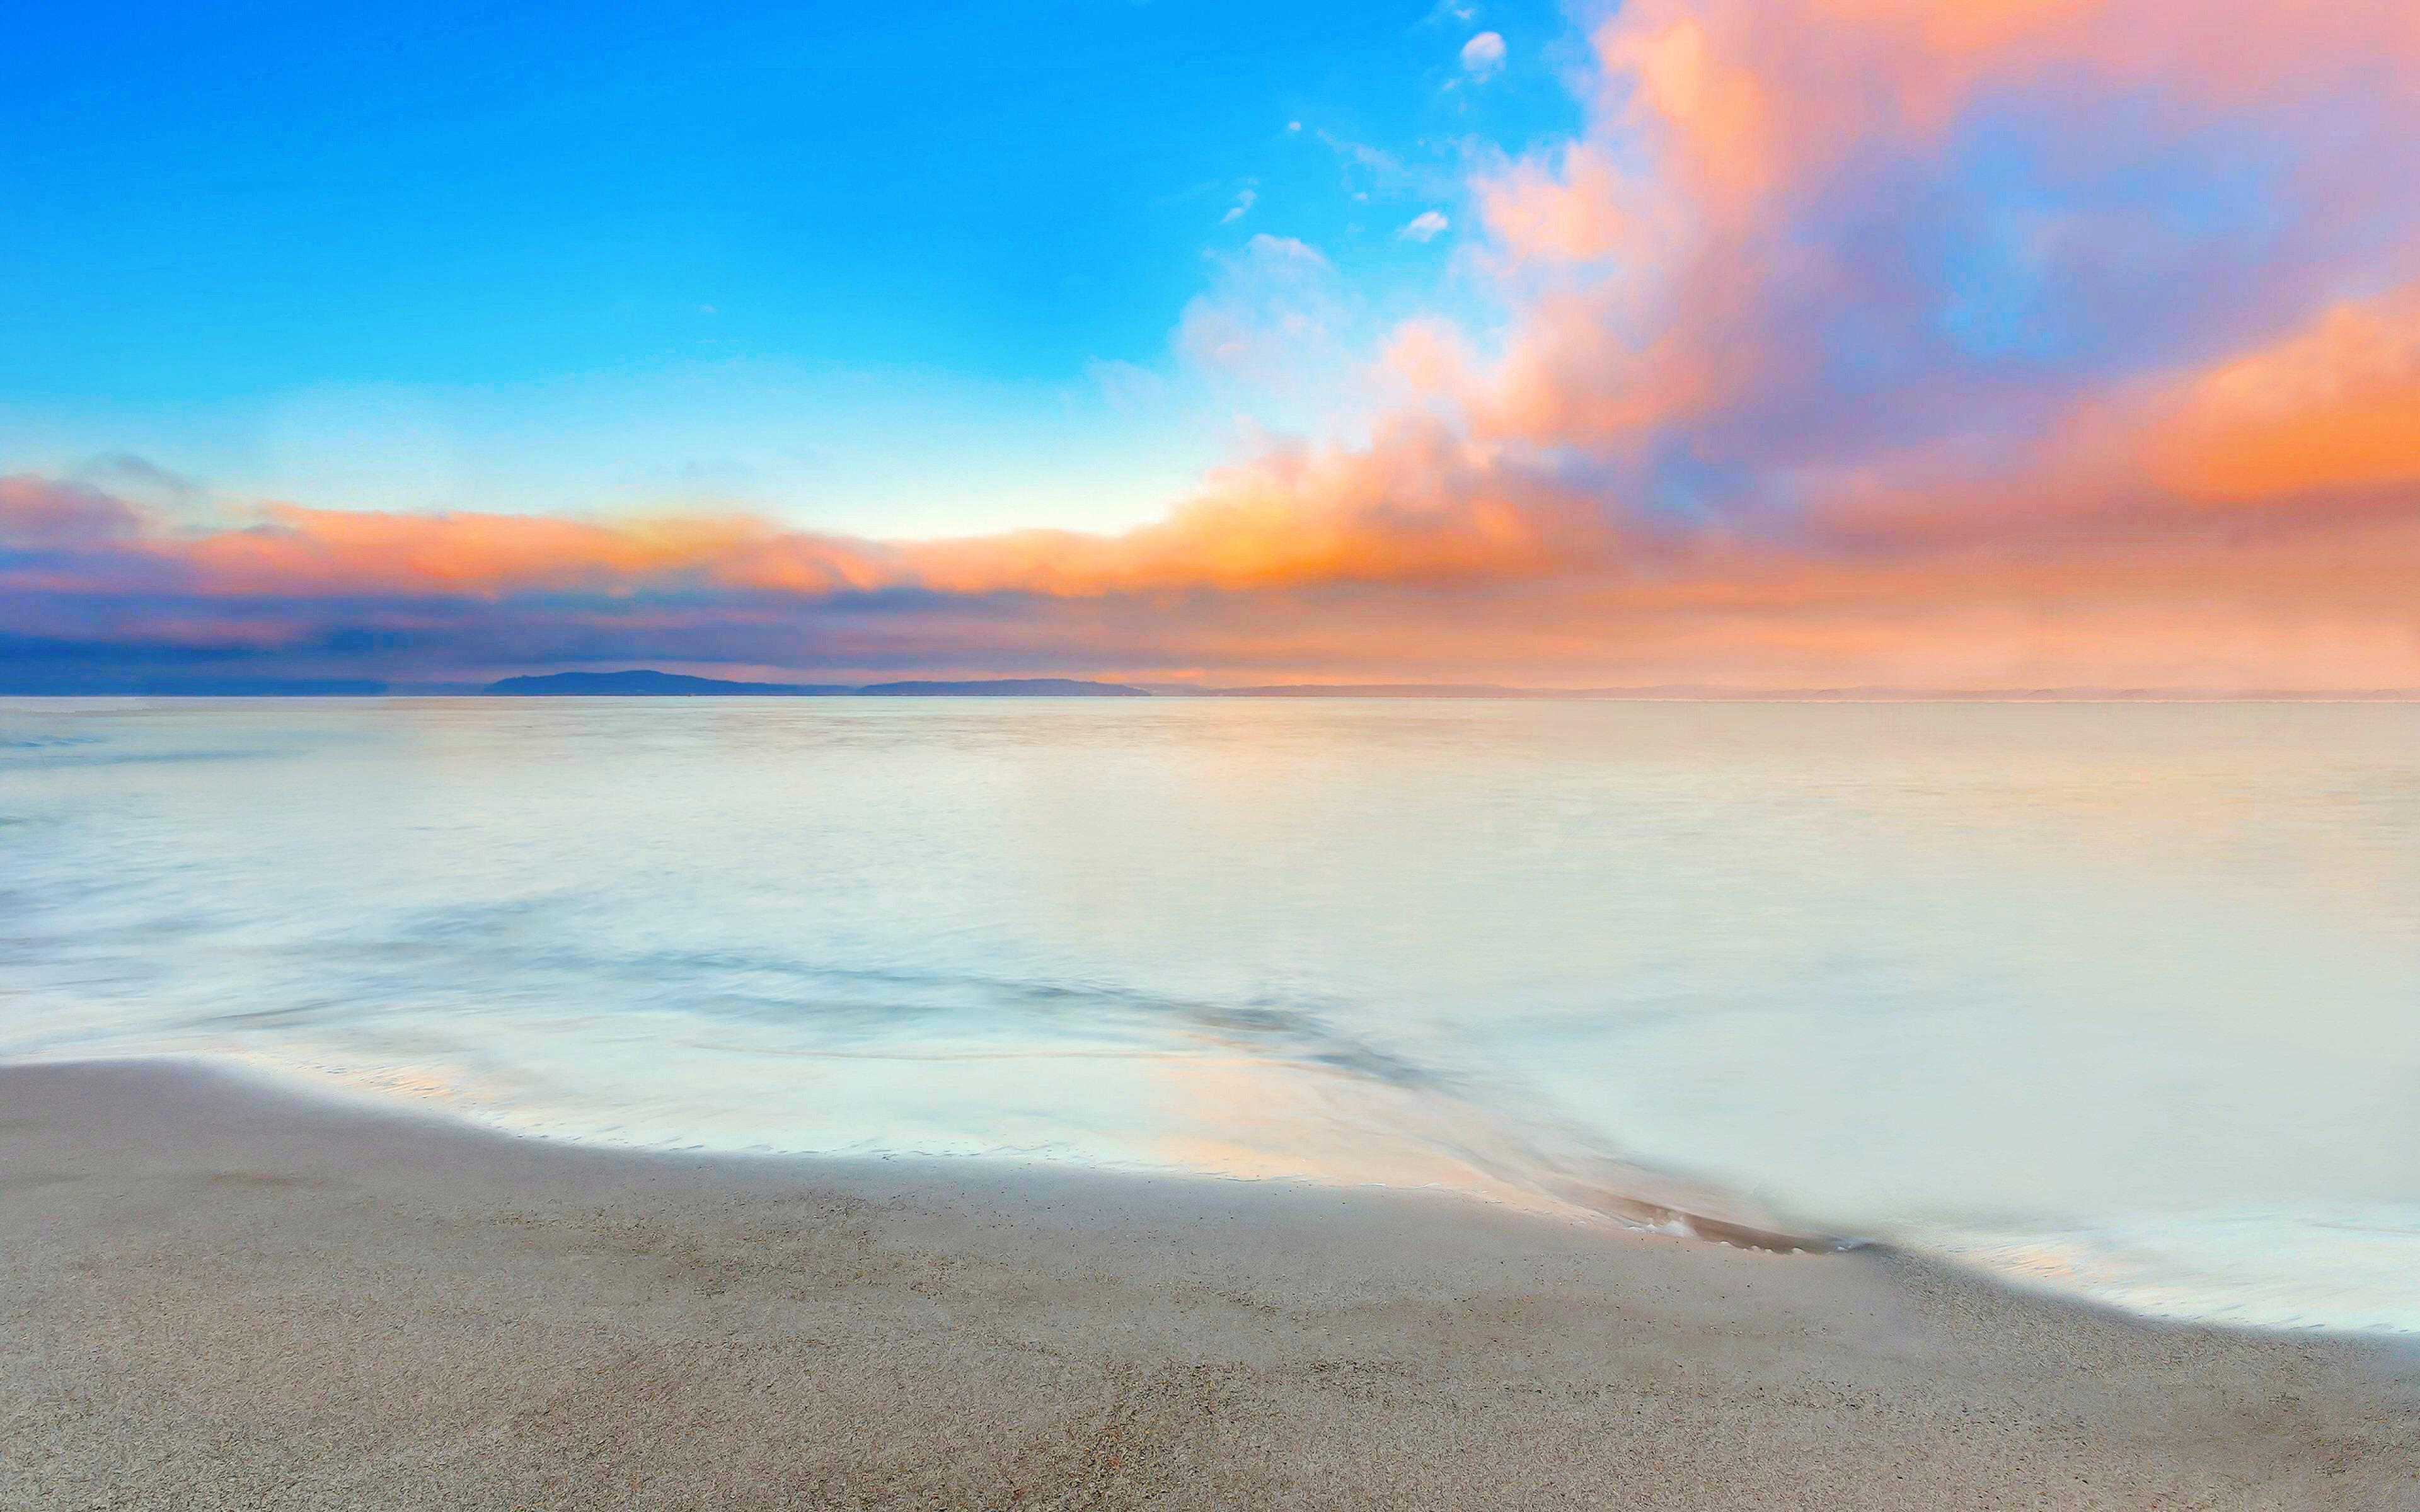 White Clouds In The Sky 4k Hd Desktop Wallpaper For 4k: Scenery Wallpapers 44